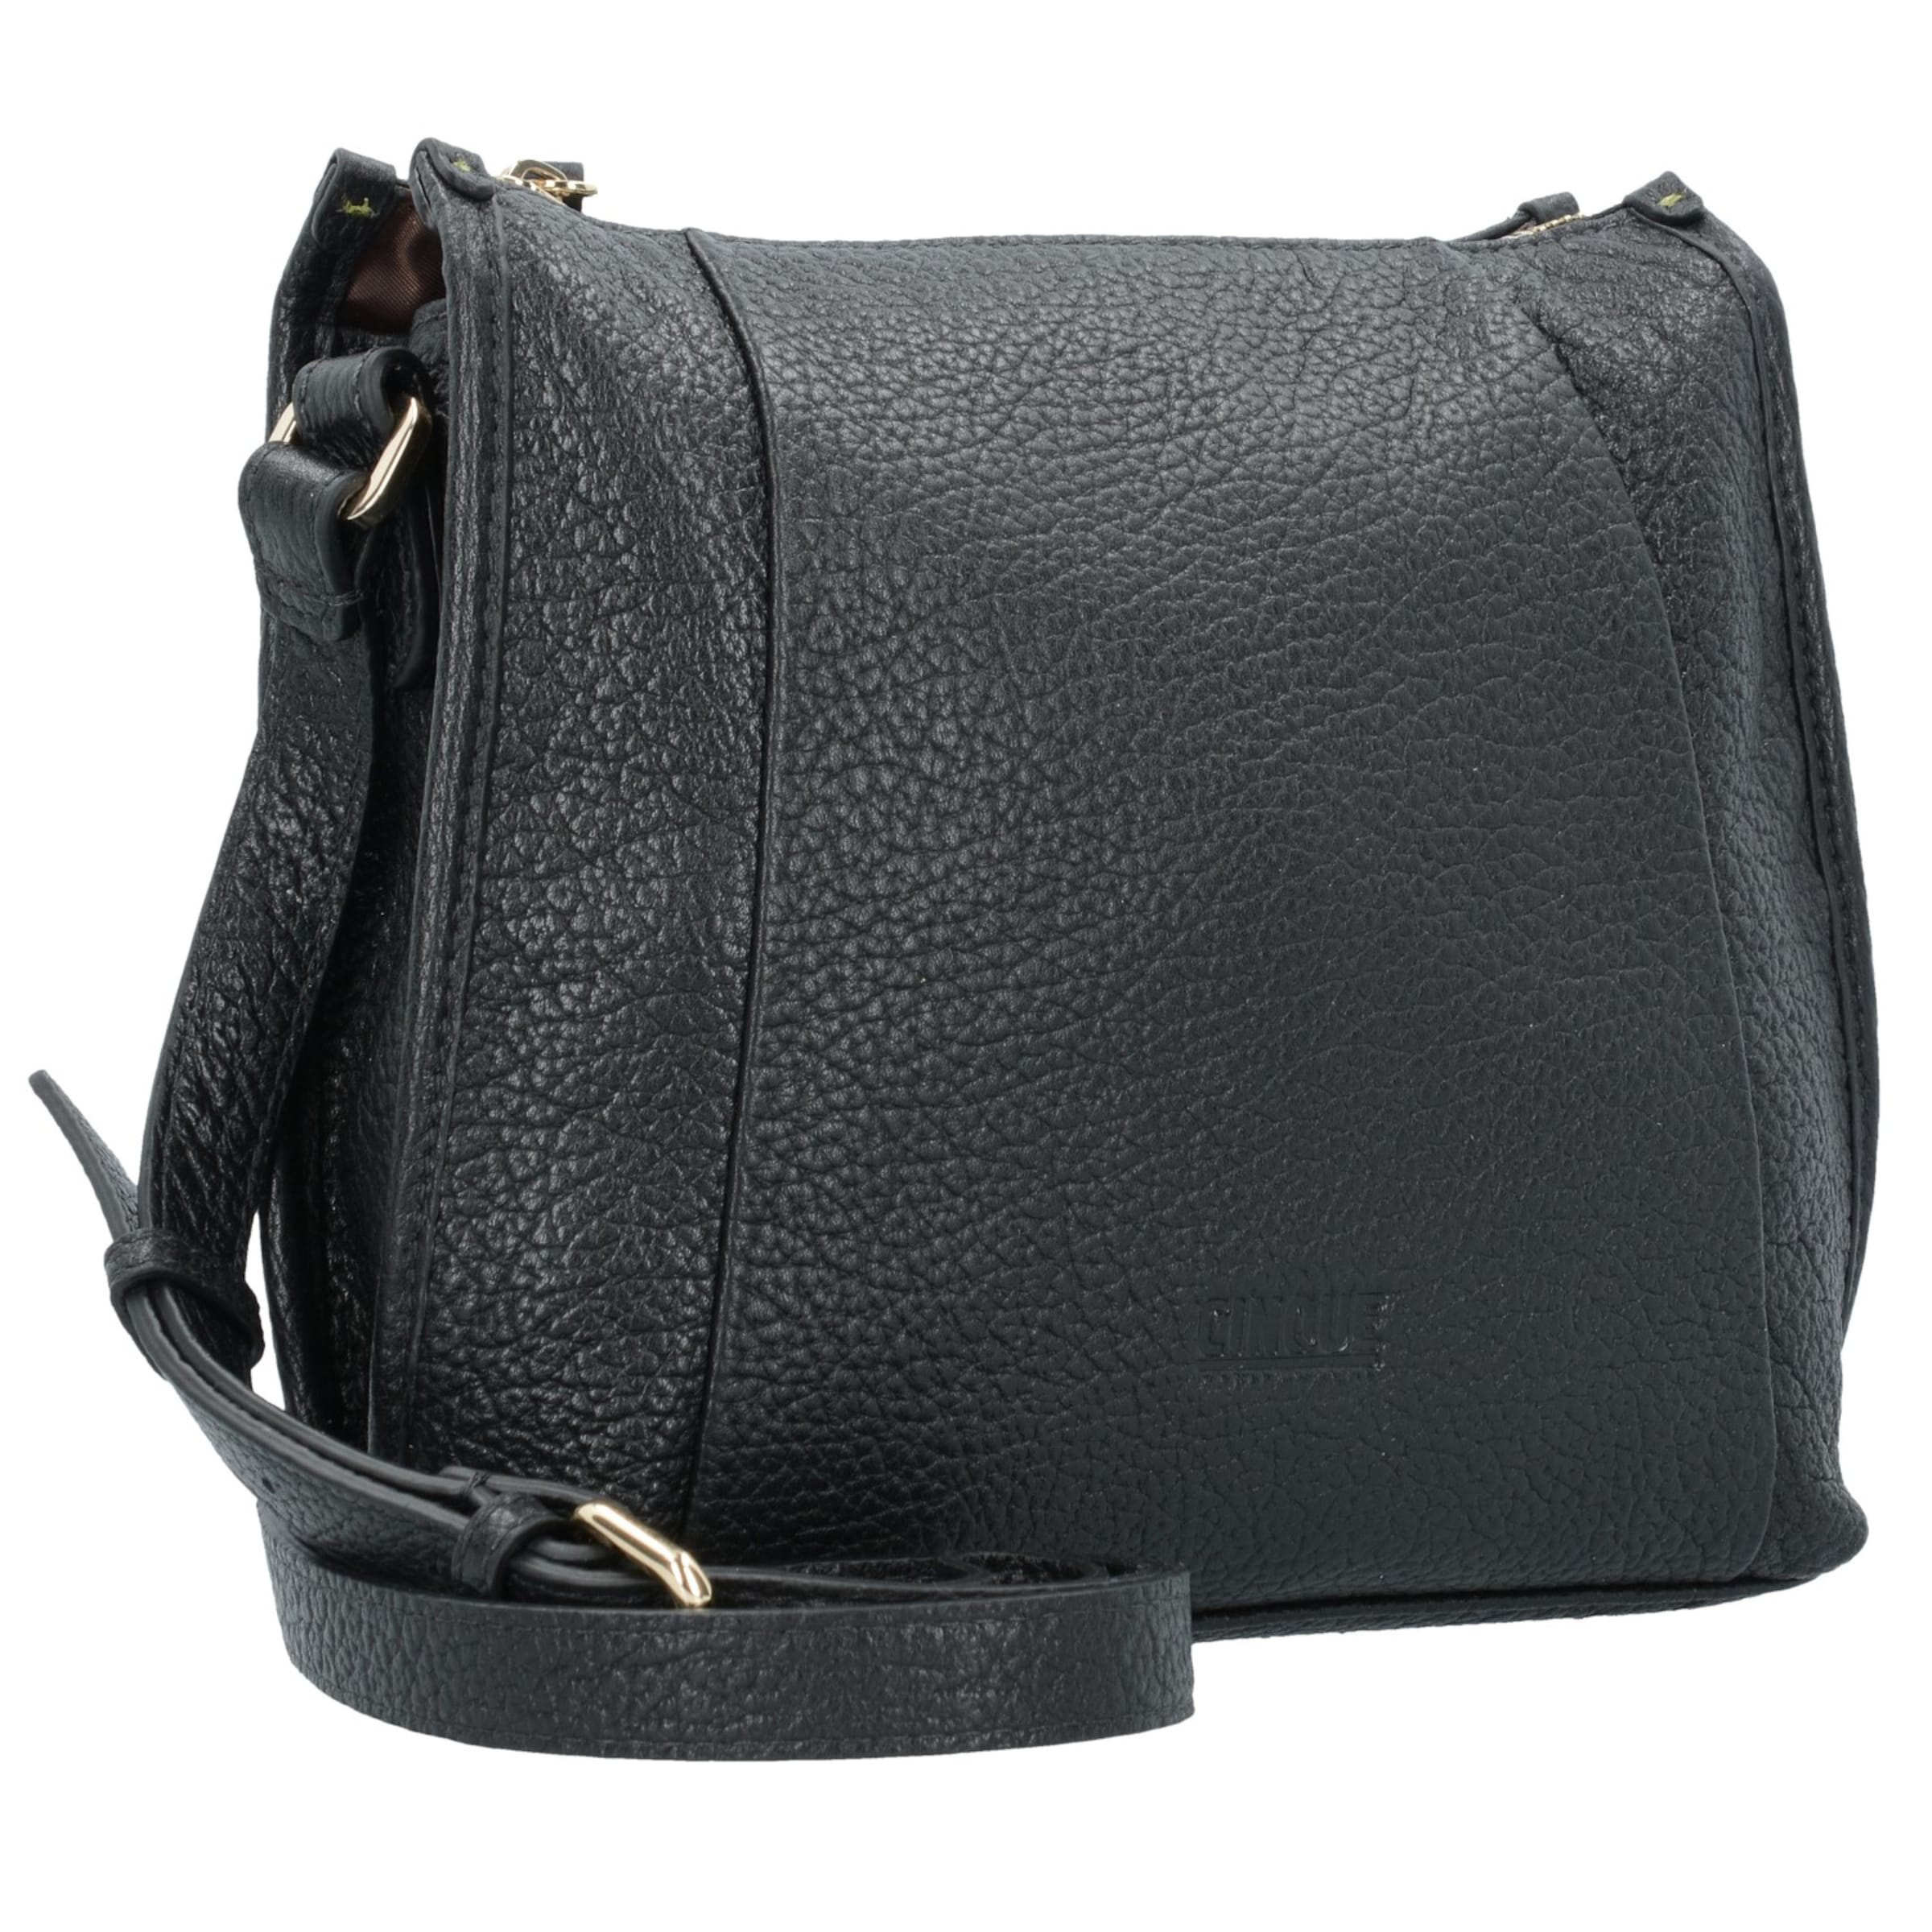 Footlocker Bilder Online Billig Verkauf Komfortabel CINQUE Raphaela Umhängetasche Leder 22 cm Günstig Kaufen Footlocker Finish Billig Verkauf Ebay FbQNg